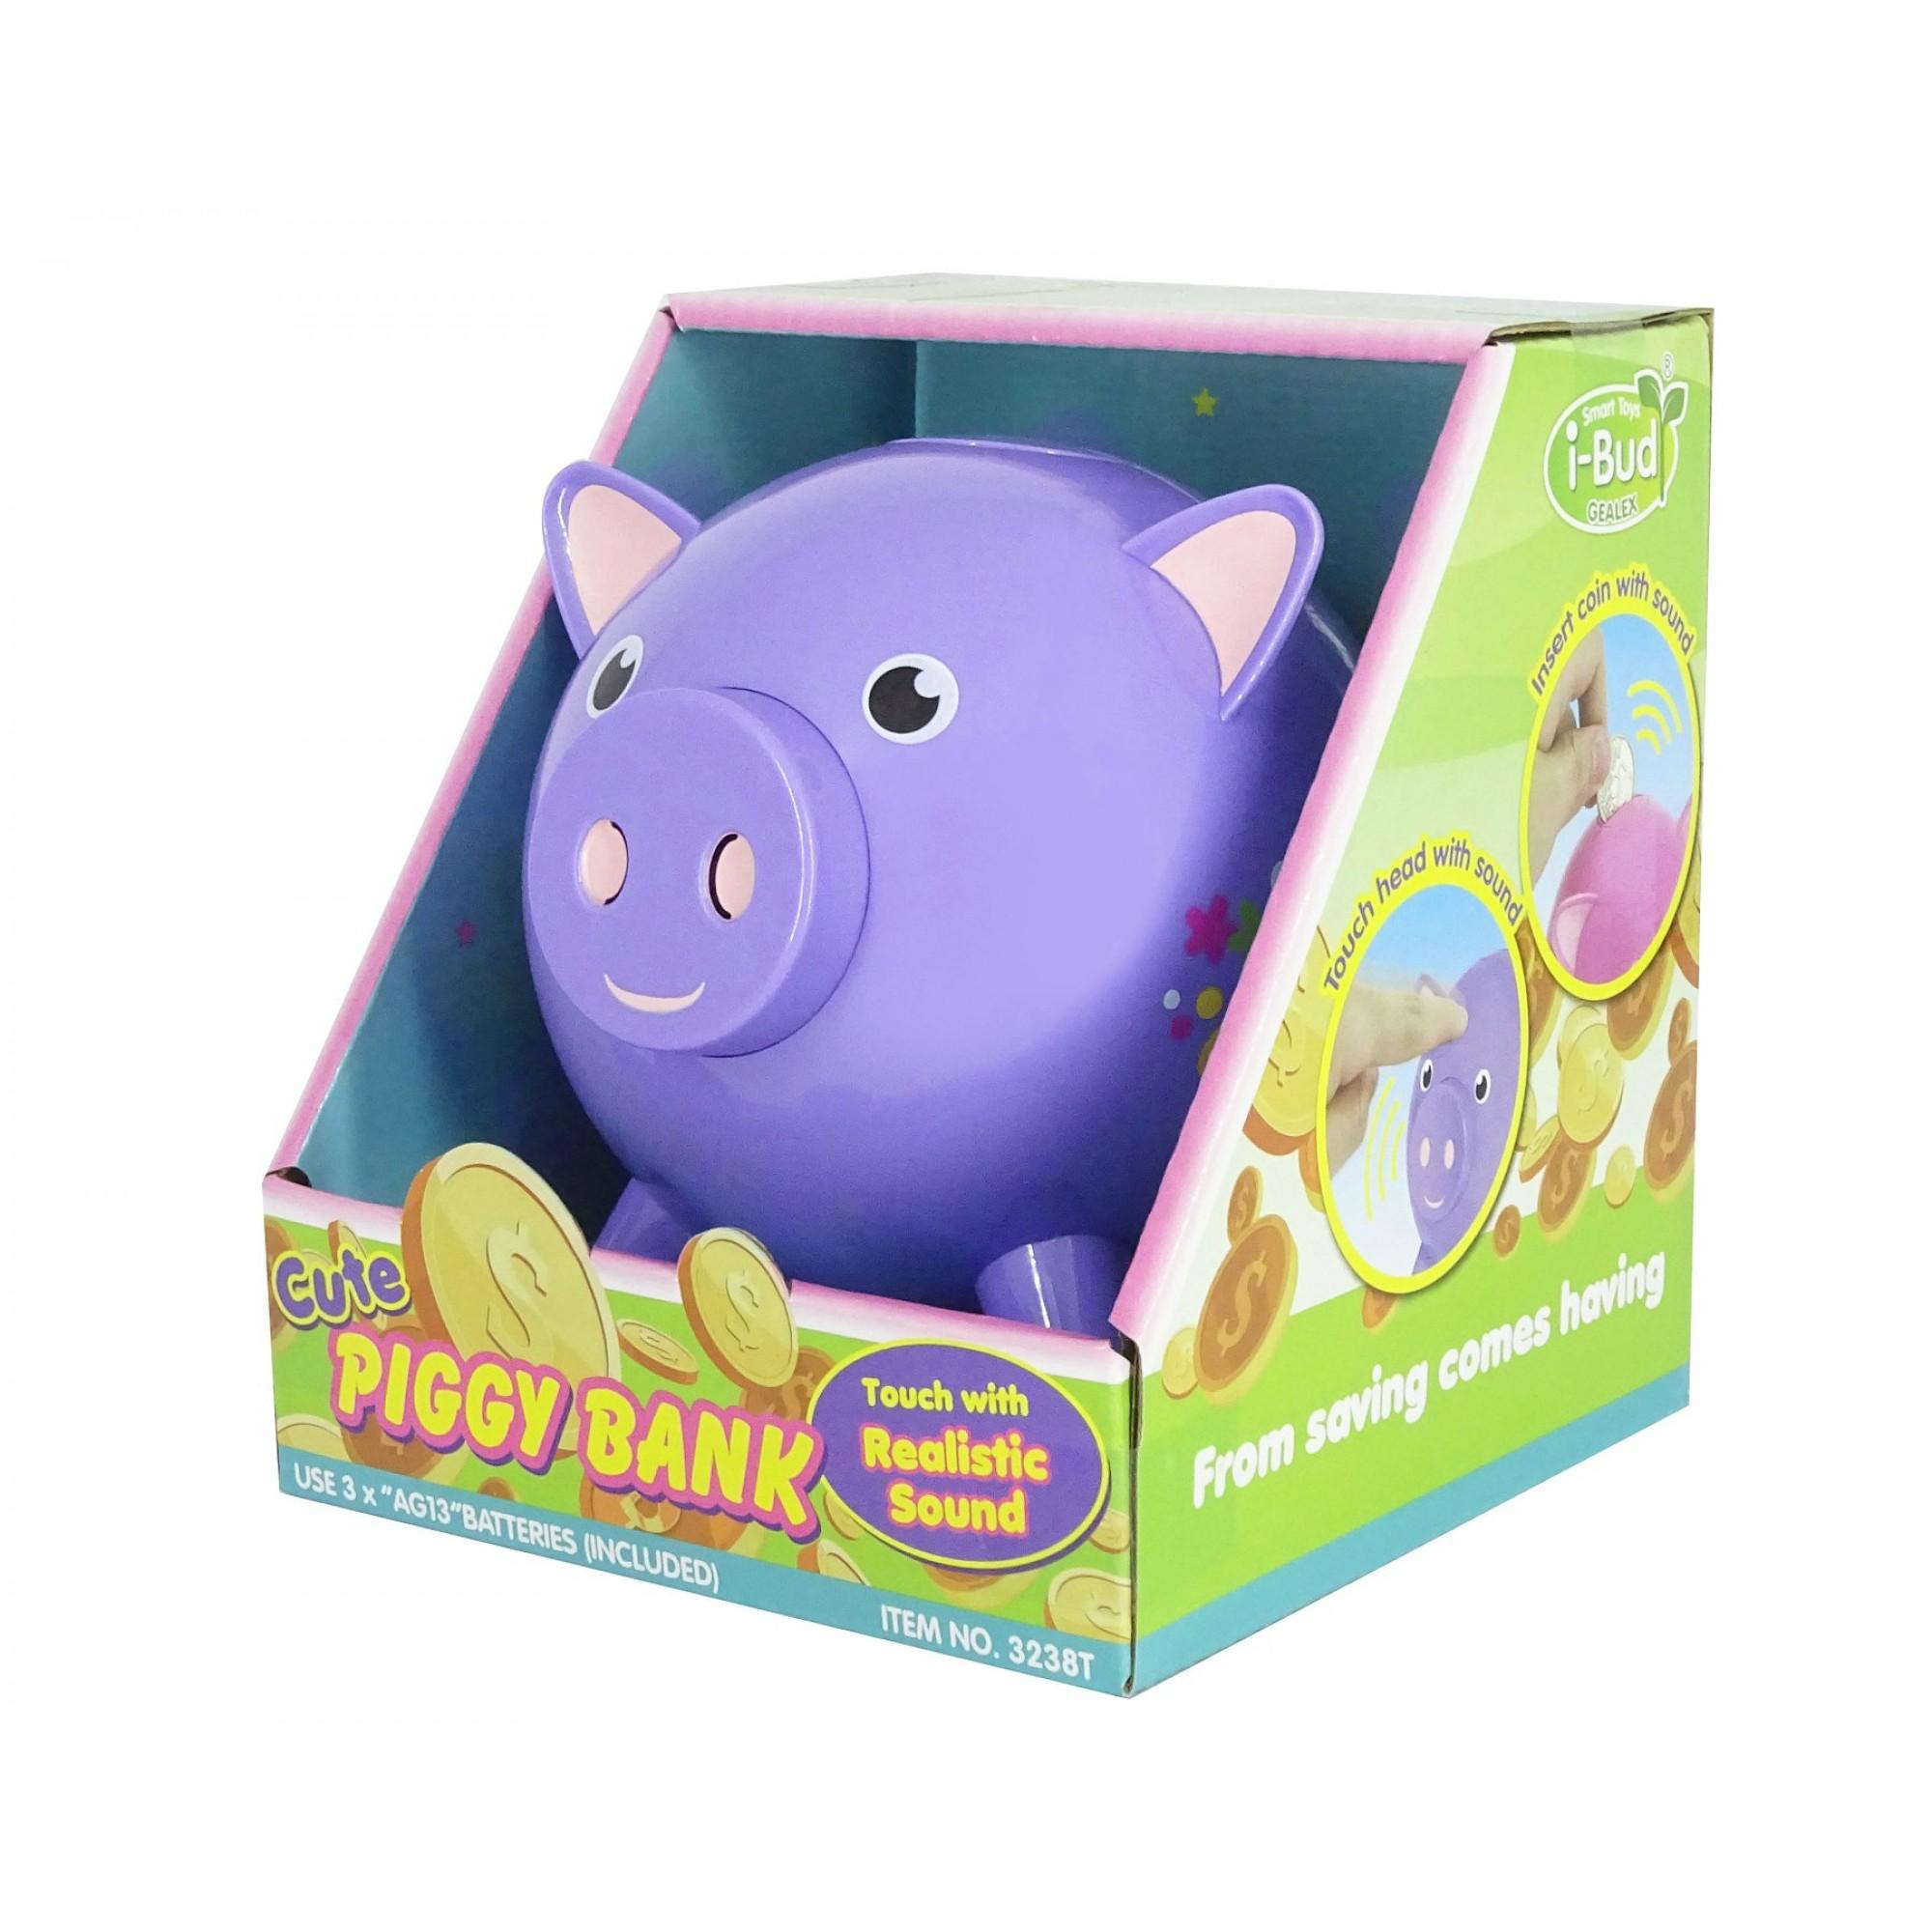 Piggy Bank with sound